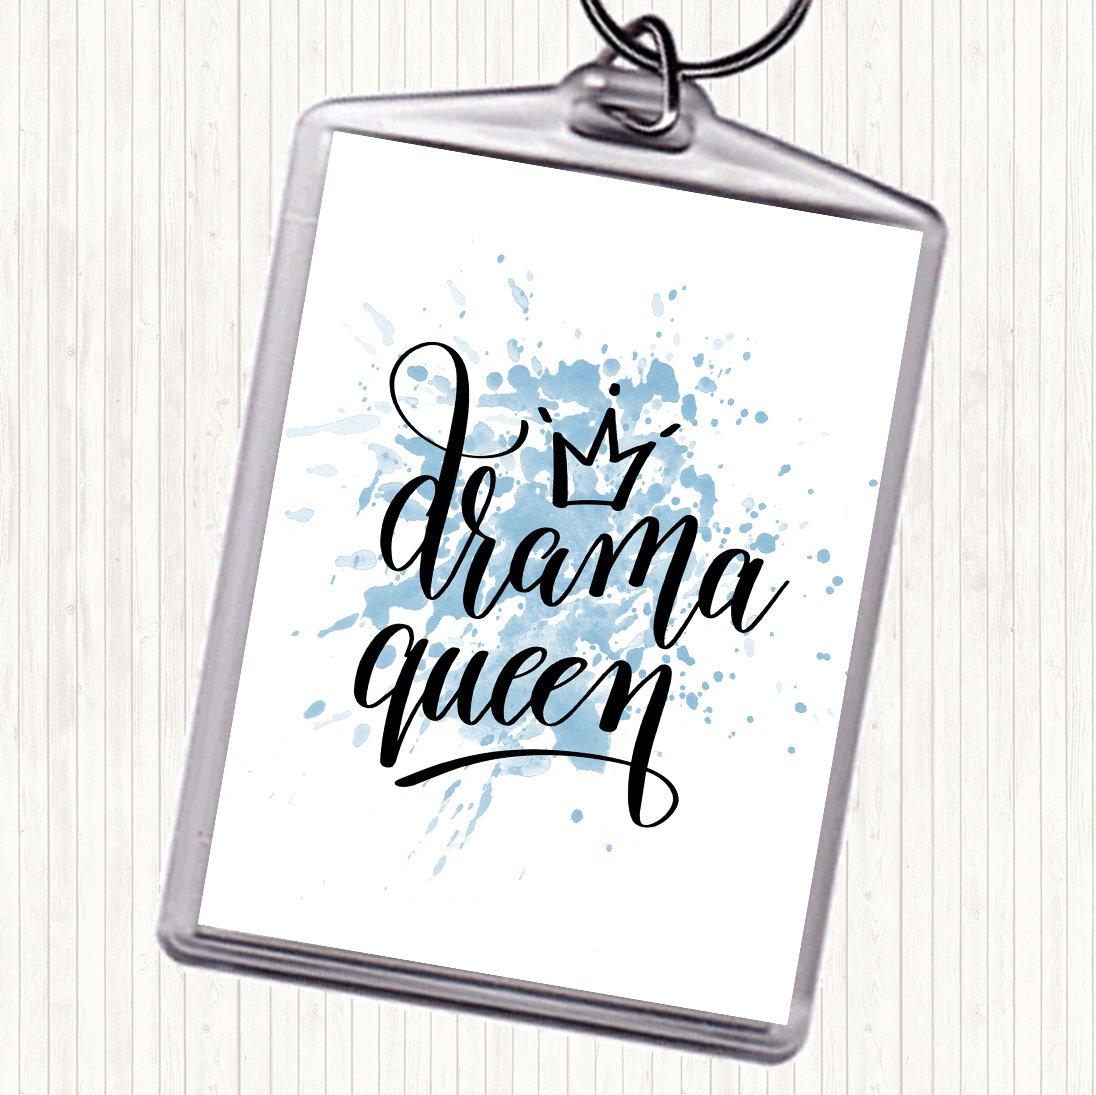 Drama Queen - Llavero con cita inspiradora: Amazon.es ...